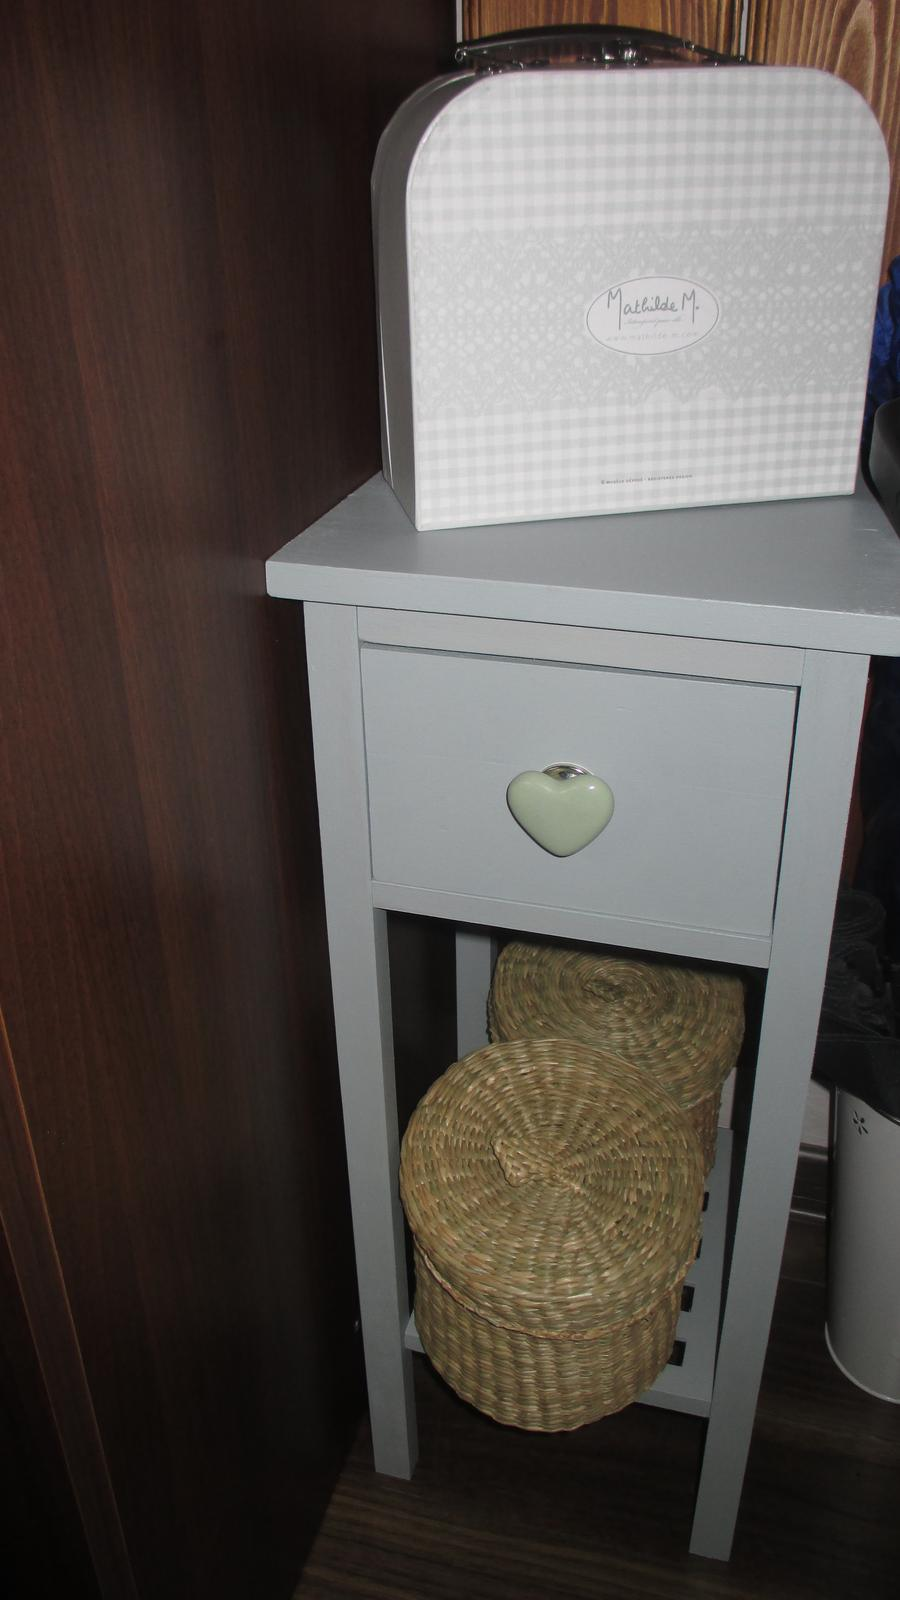 šedý stolík s porcelánovým úchytom srdce  - Obrázok č. 1